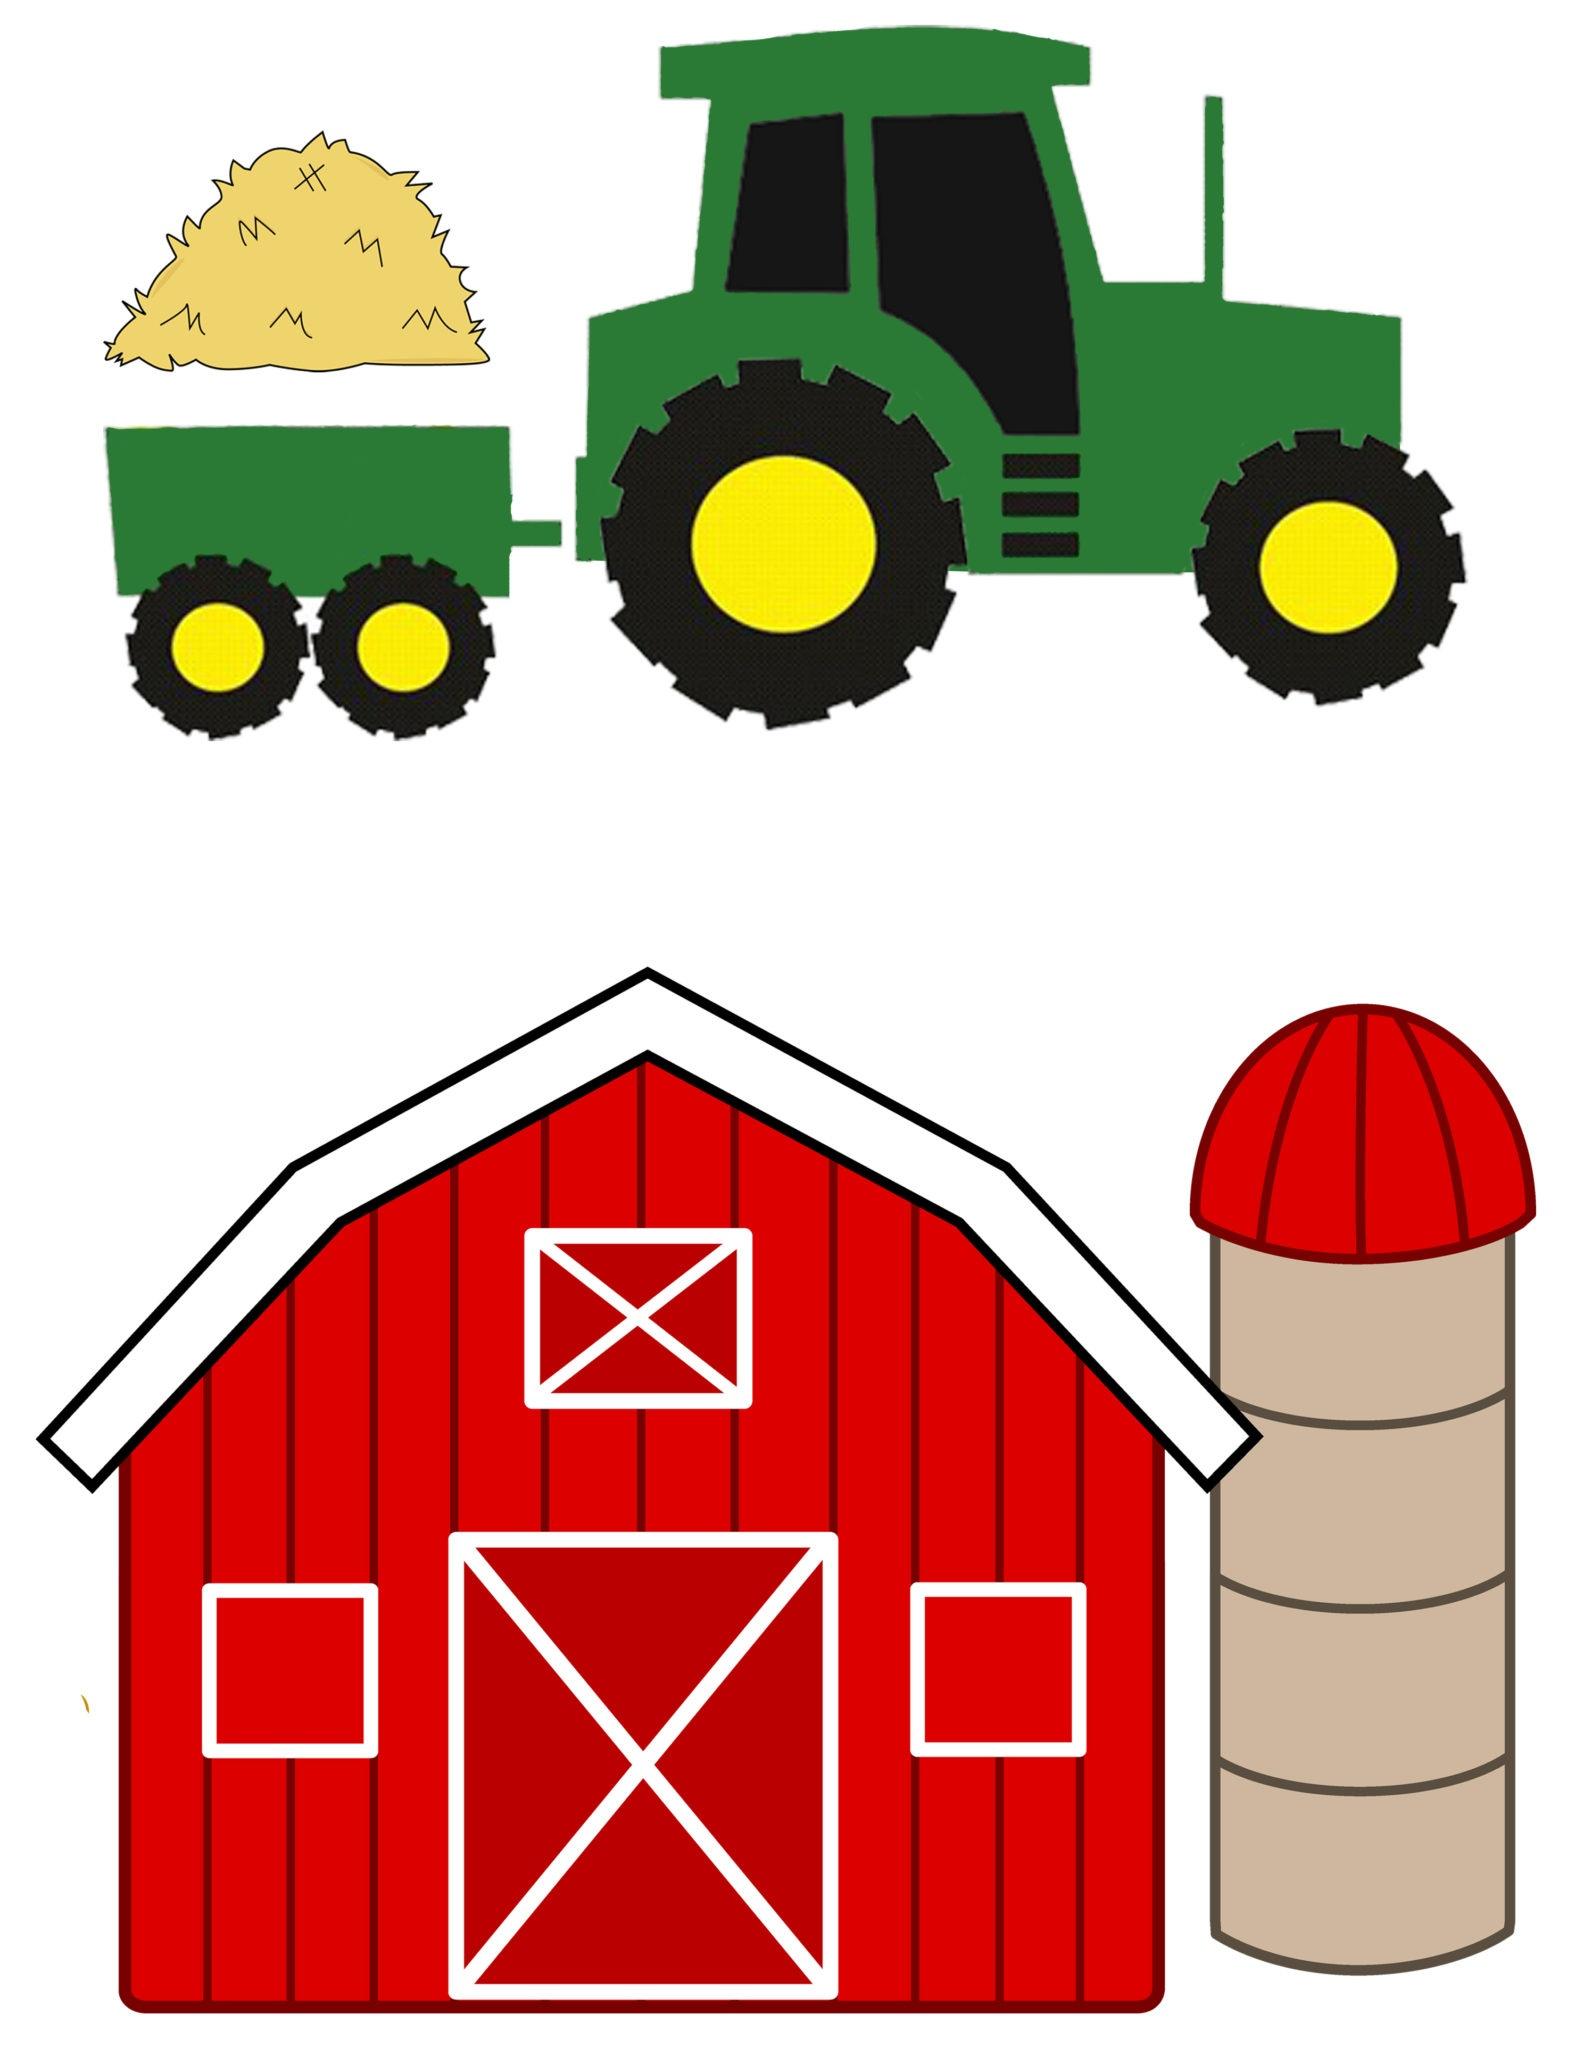 Farm Animal Templates To Cut Out - Kaza.psstech.co - Free Printable Farm Animal Cutouts